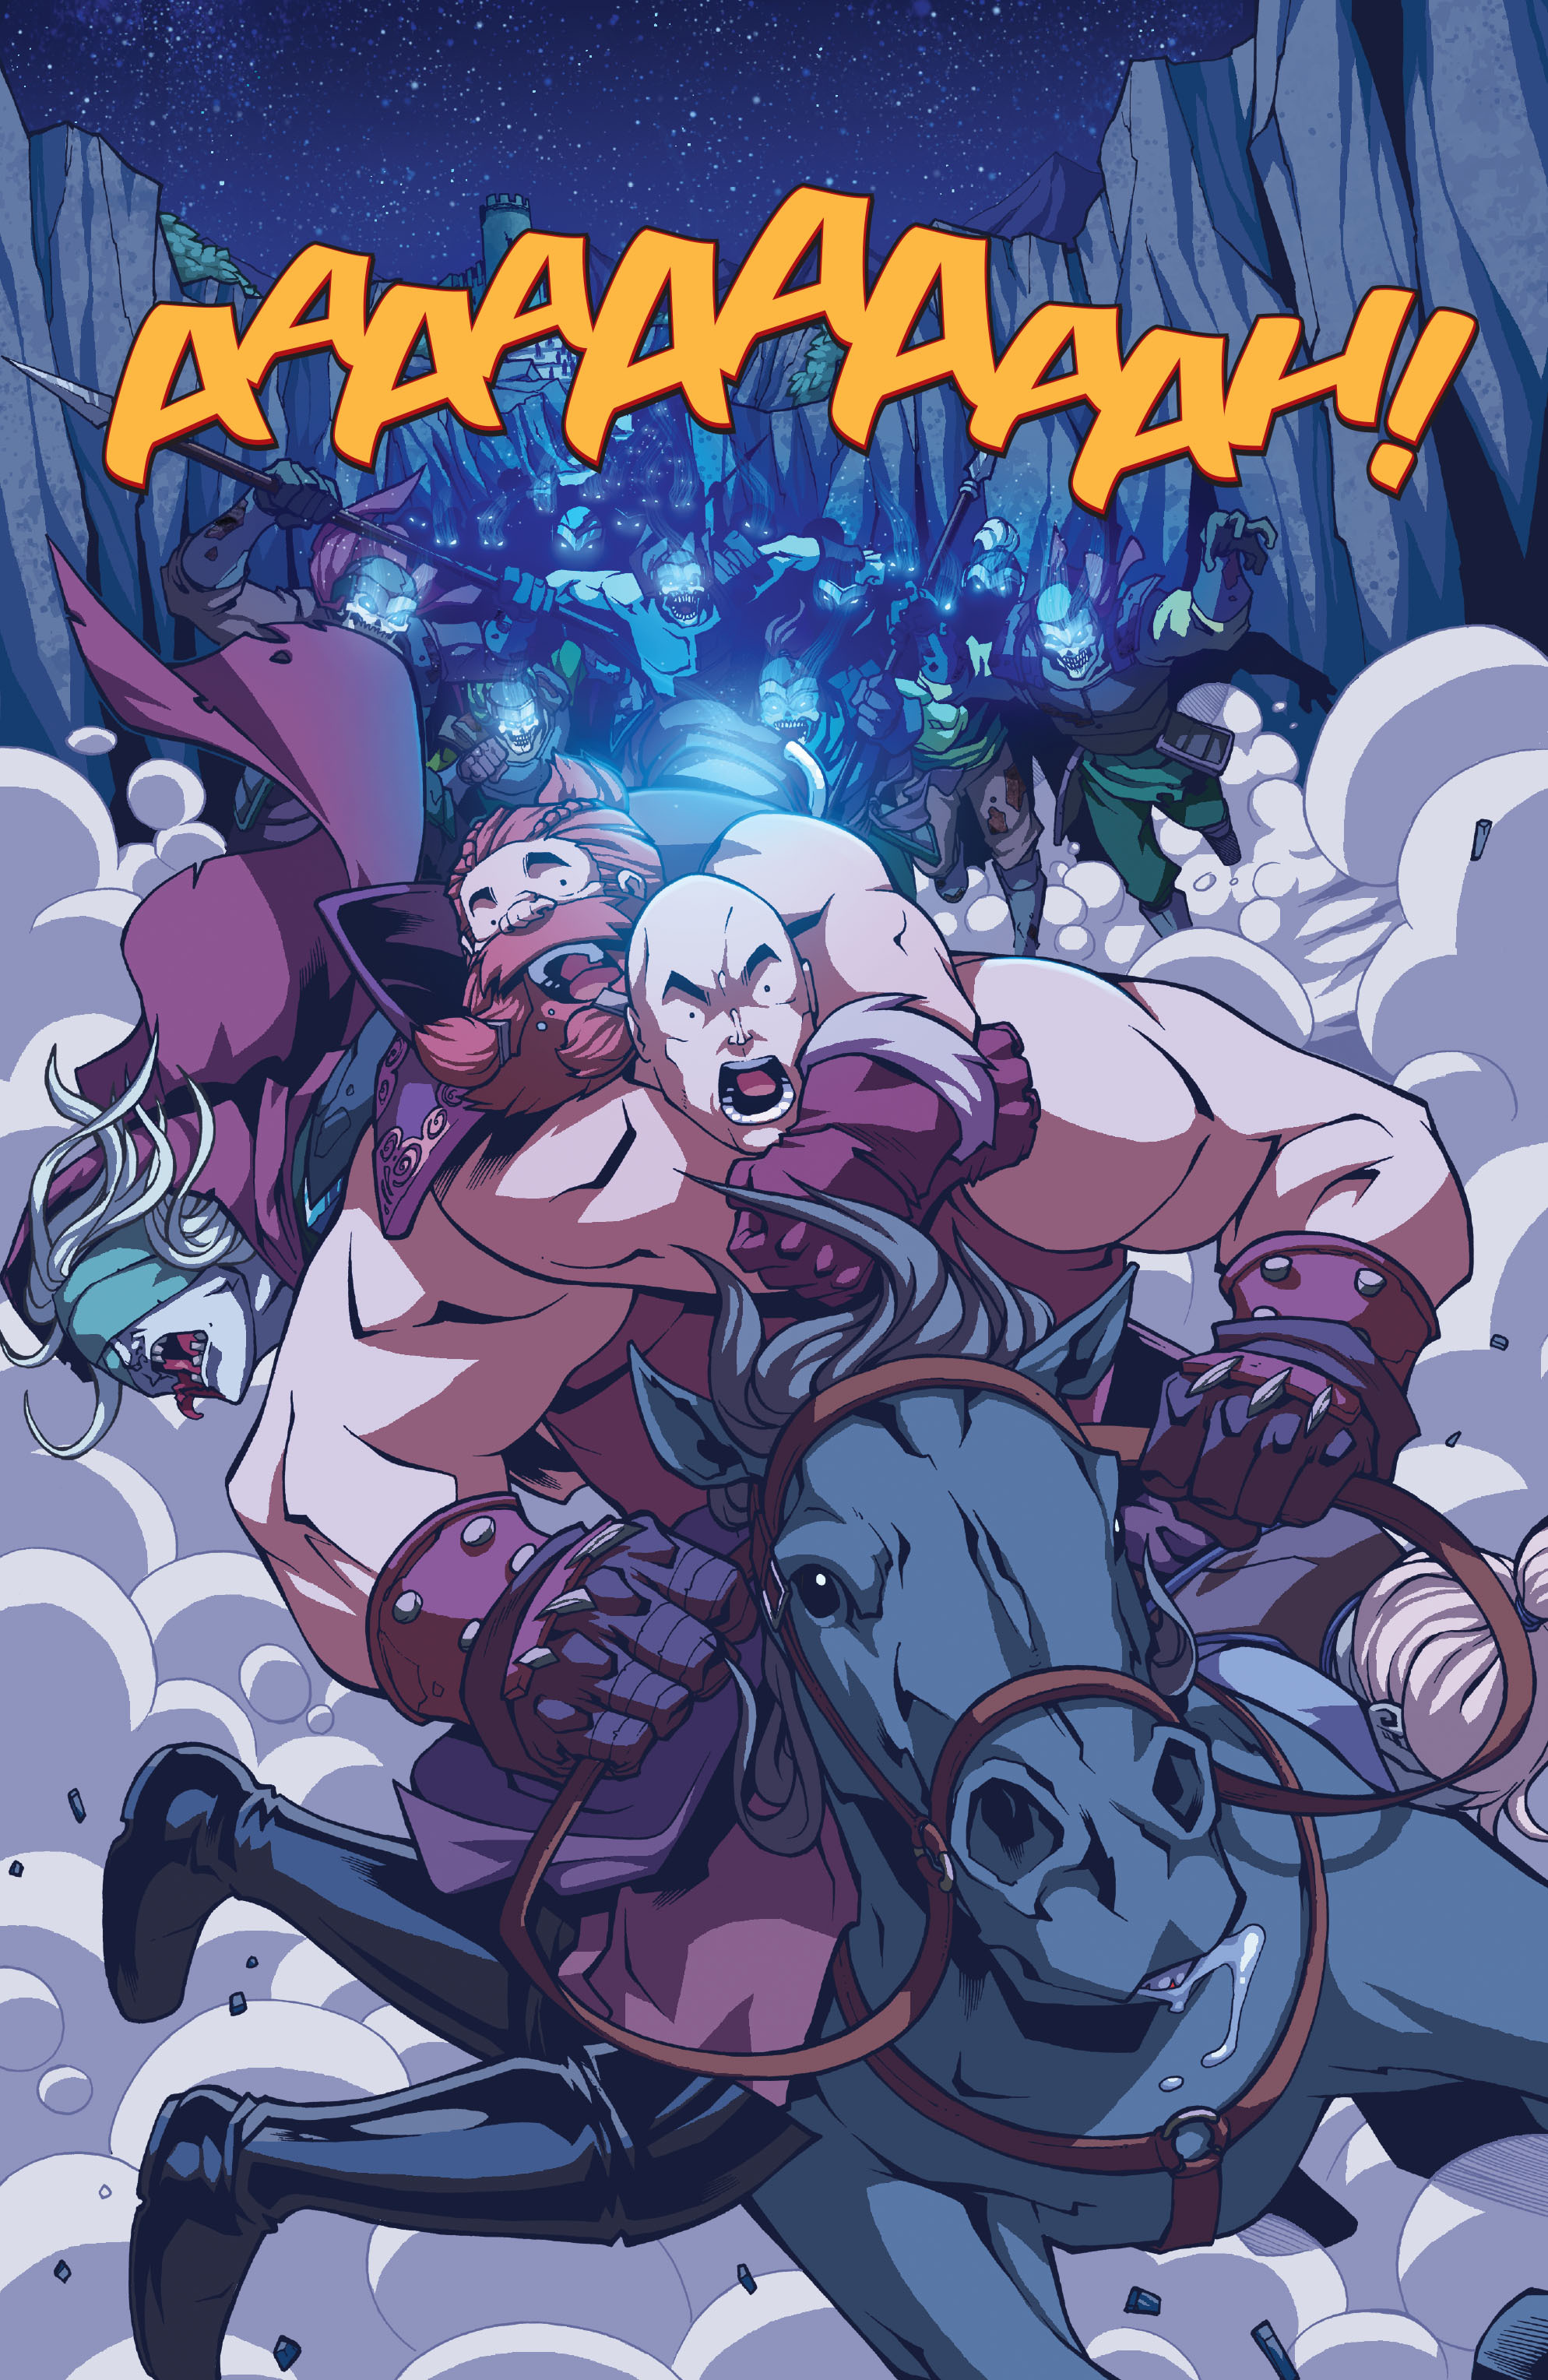 Read online Skullkickers comic -  Issue #5 - 3